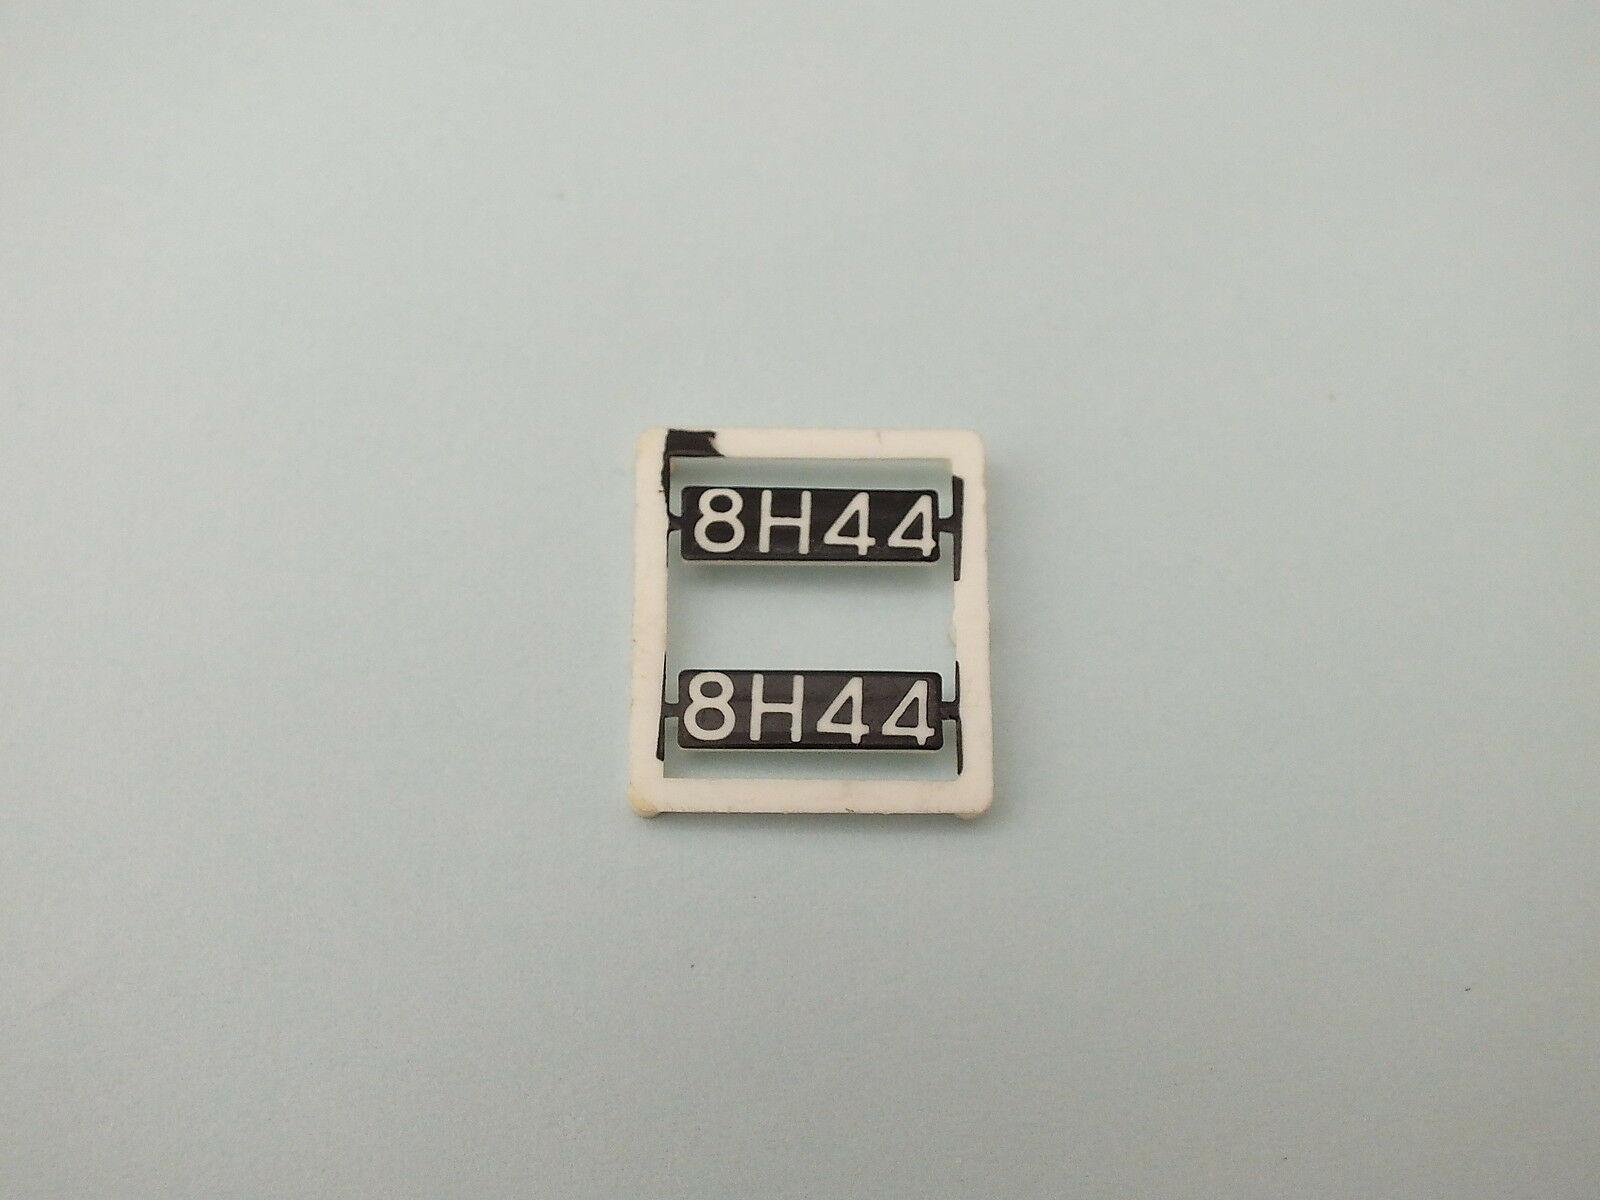 S9668/2 #  HORNBY  TRIANG DIESEL LOCO HEAD CODES CLASS 25  8H44  T14C